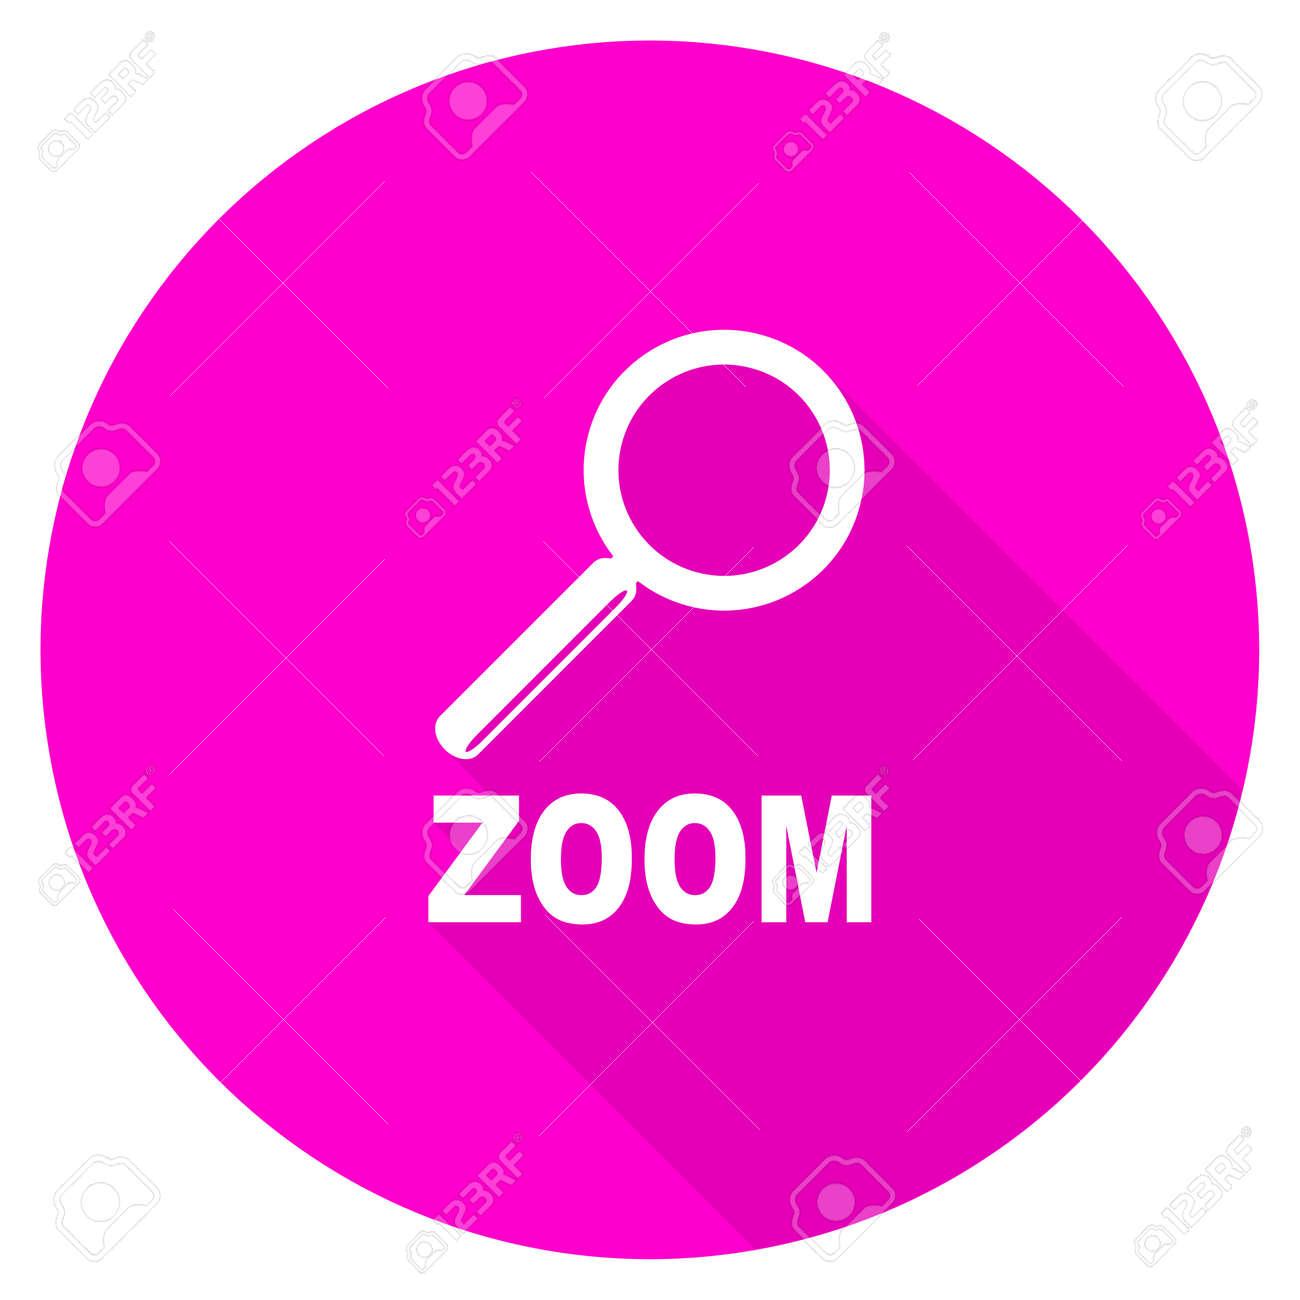 Zoom Flat Pink Icon Stock Photo